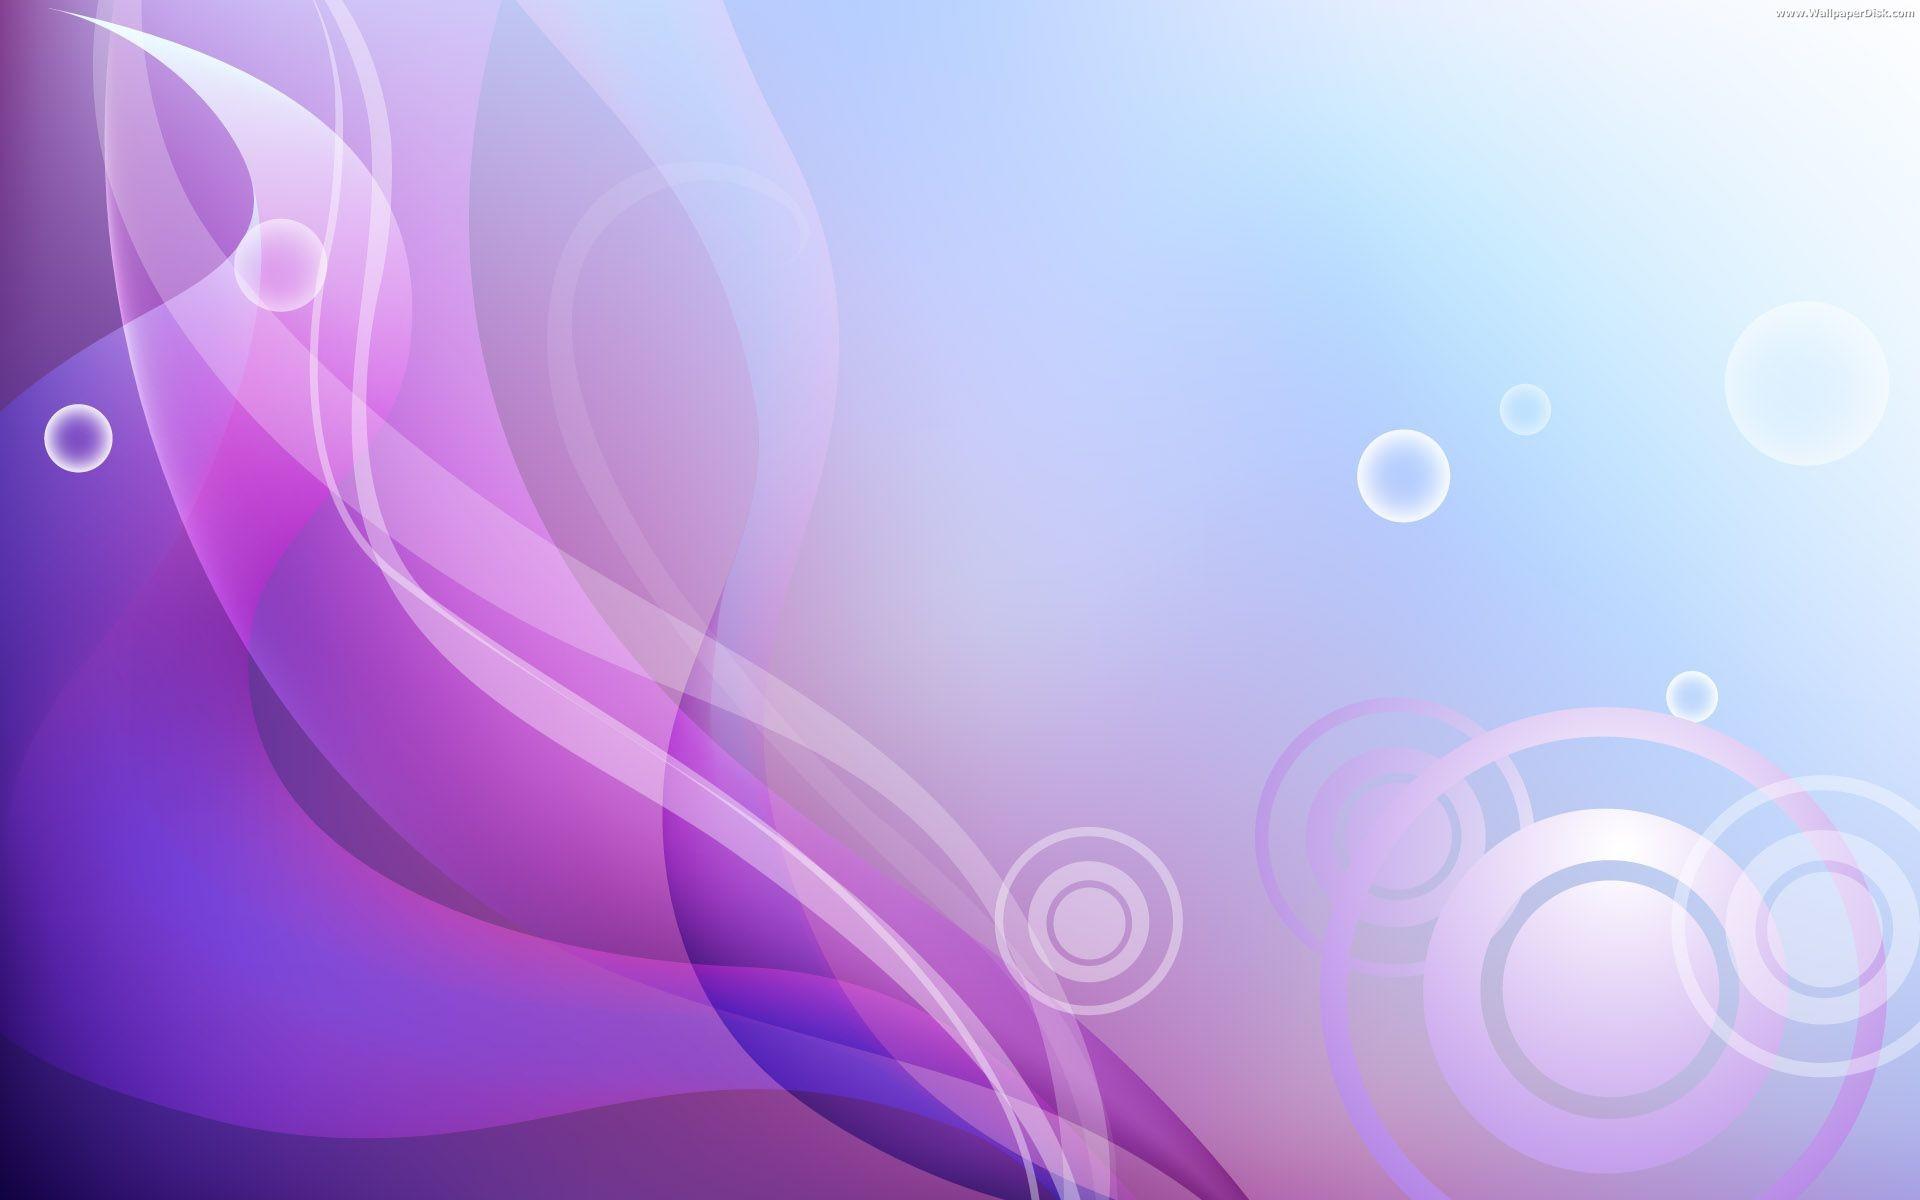 Free Crystal circles wallpaper background